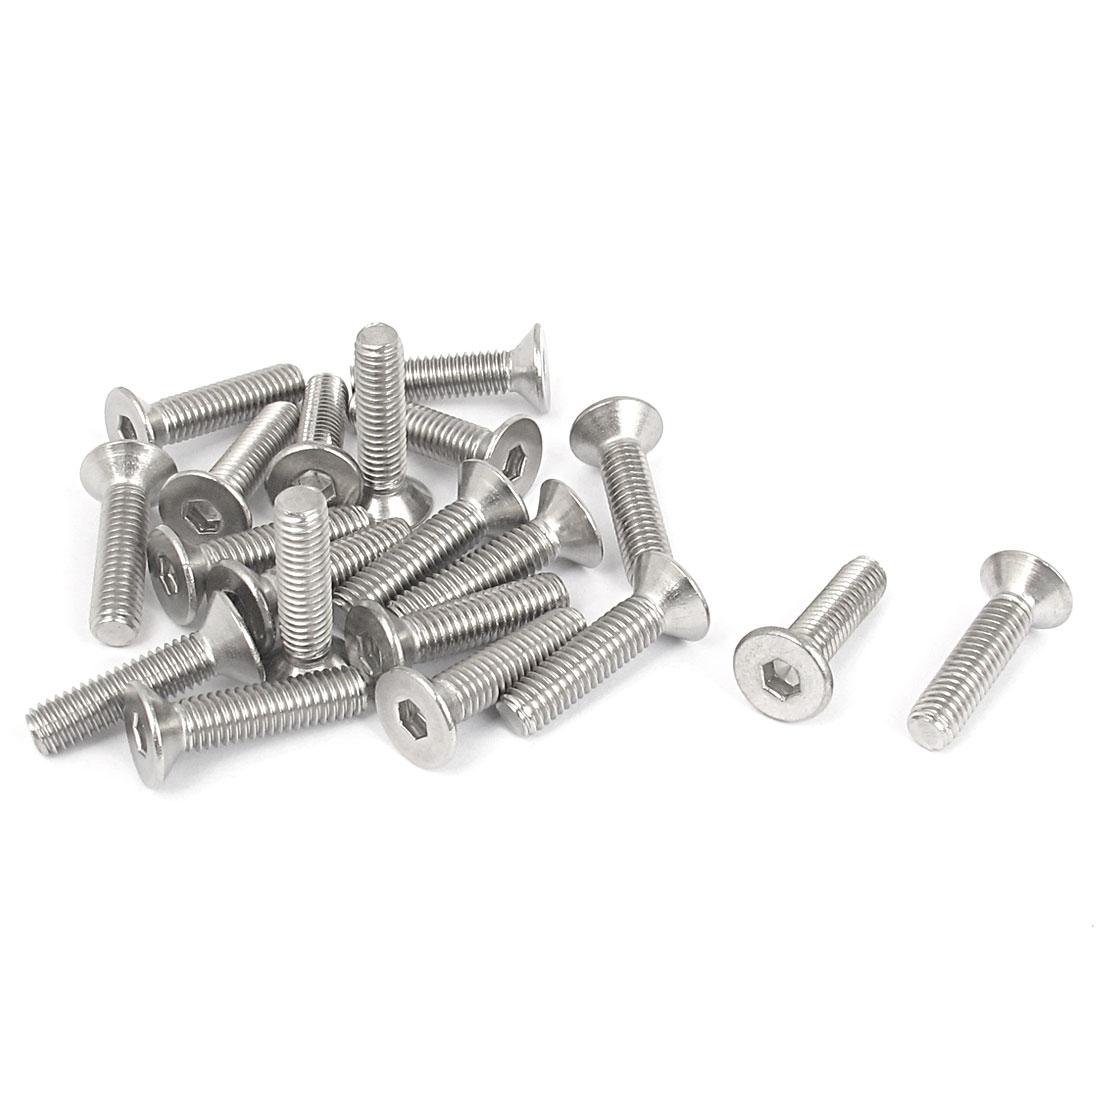 M6 x 25mm Metric 304 Stainless Steel Hex Socket Countersunk Flat Head Screw Bolts 20PCS